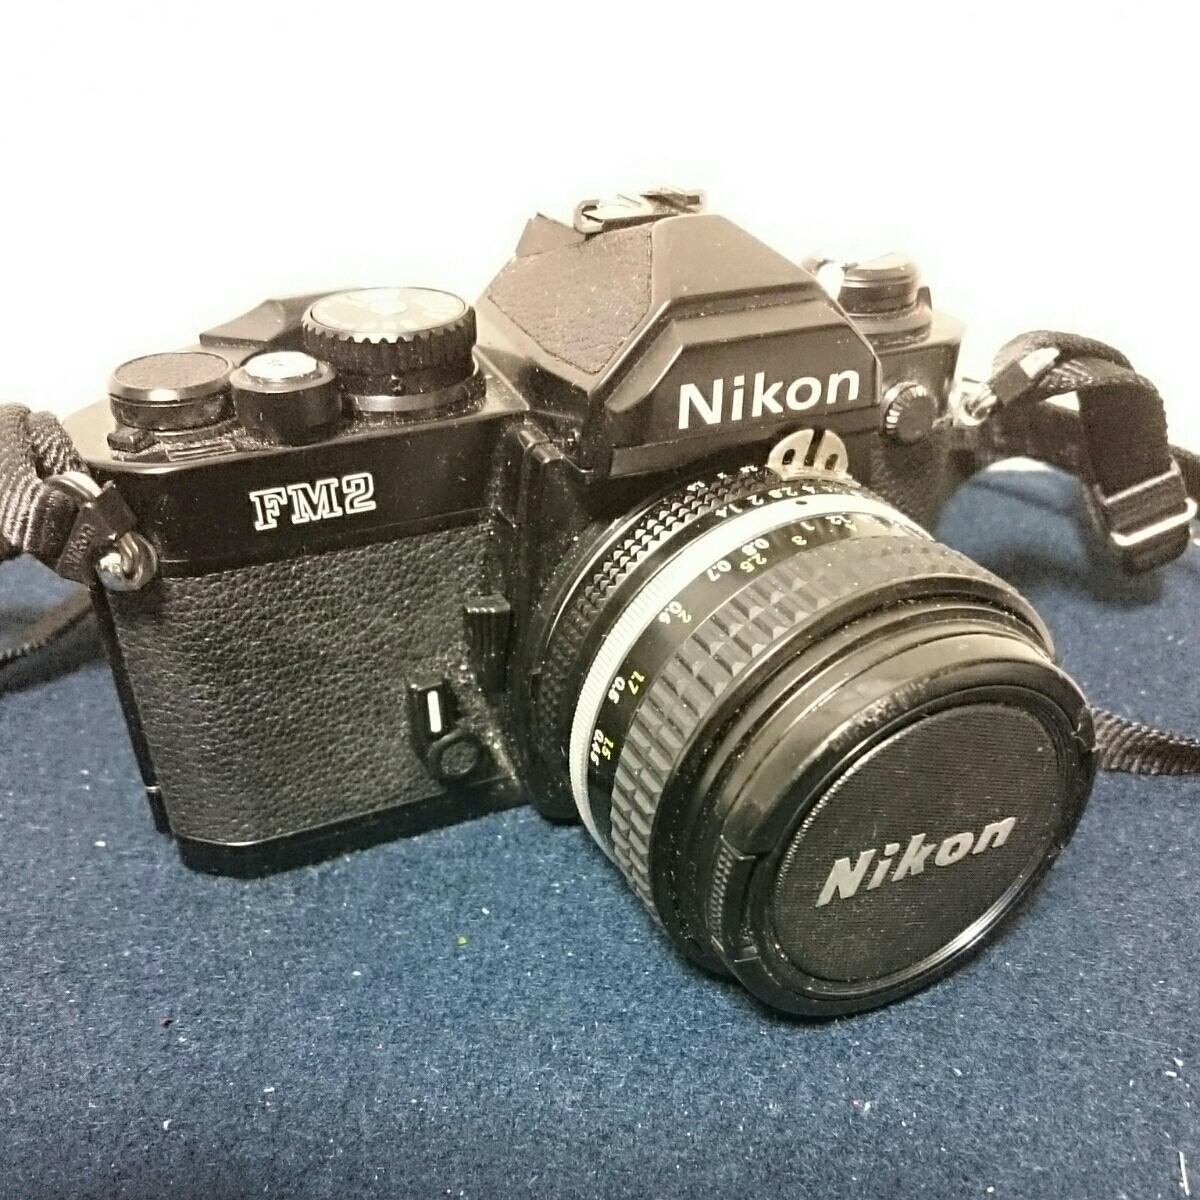 Nikon FM2 ブラックボディ ニコン 一眼レフカメラ 動作未確認 ケース傷みあり_画像2